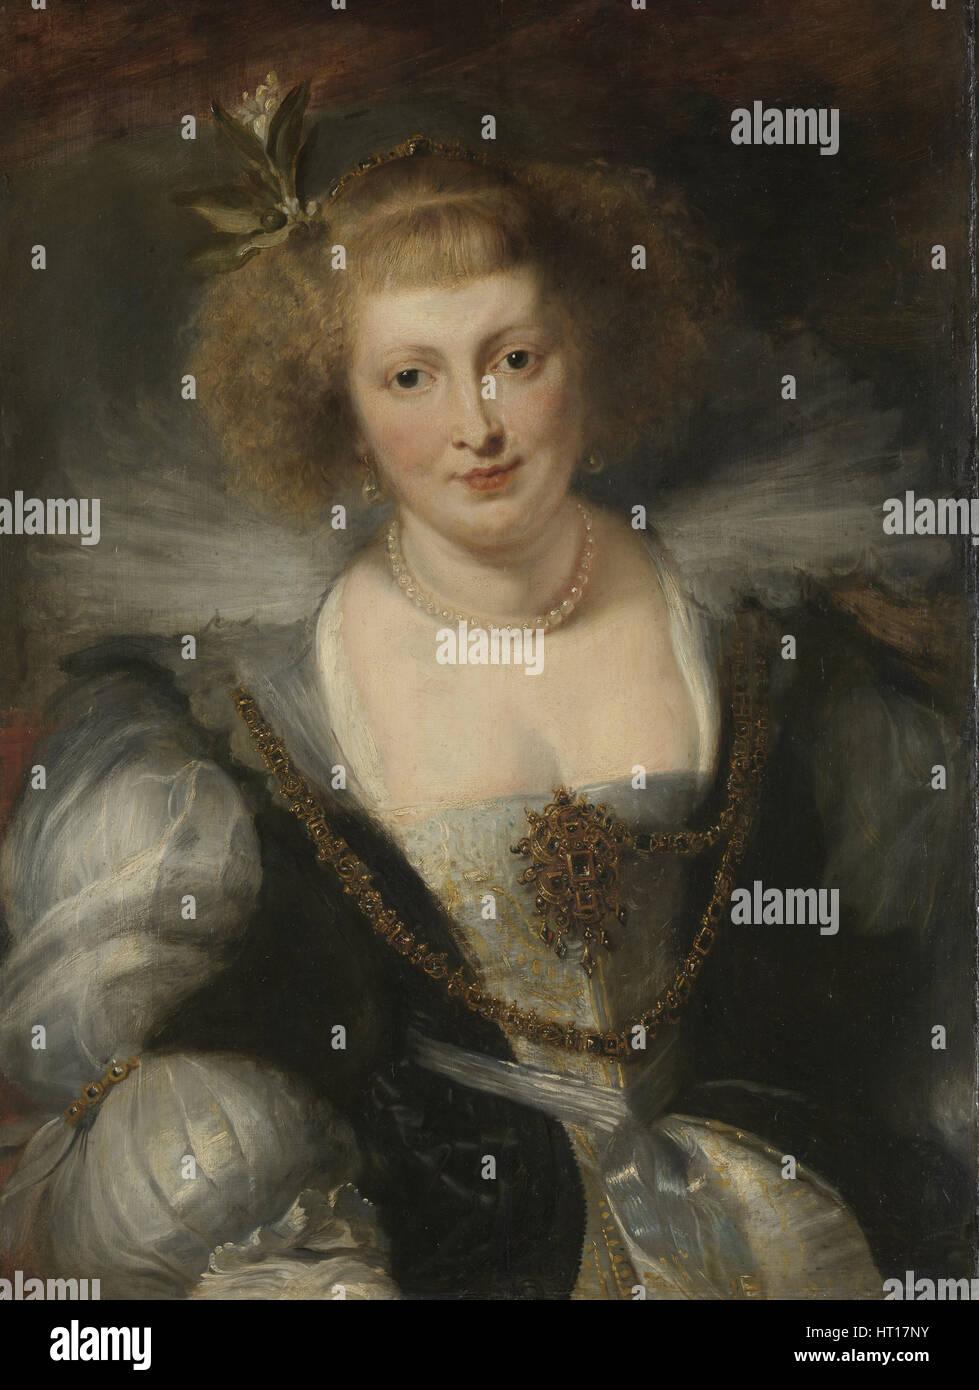 Hélène Fourment, c. 1635. Artist: Rubens, Peter Paul, (School) - Stock Image